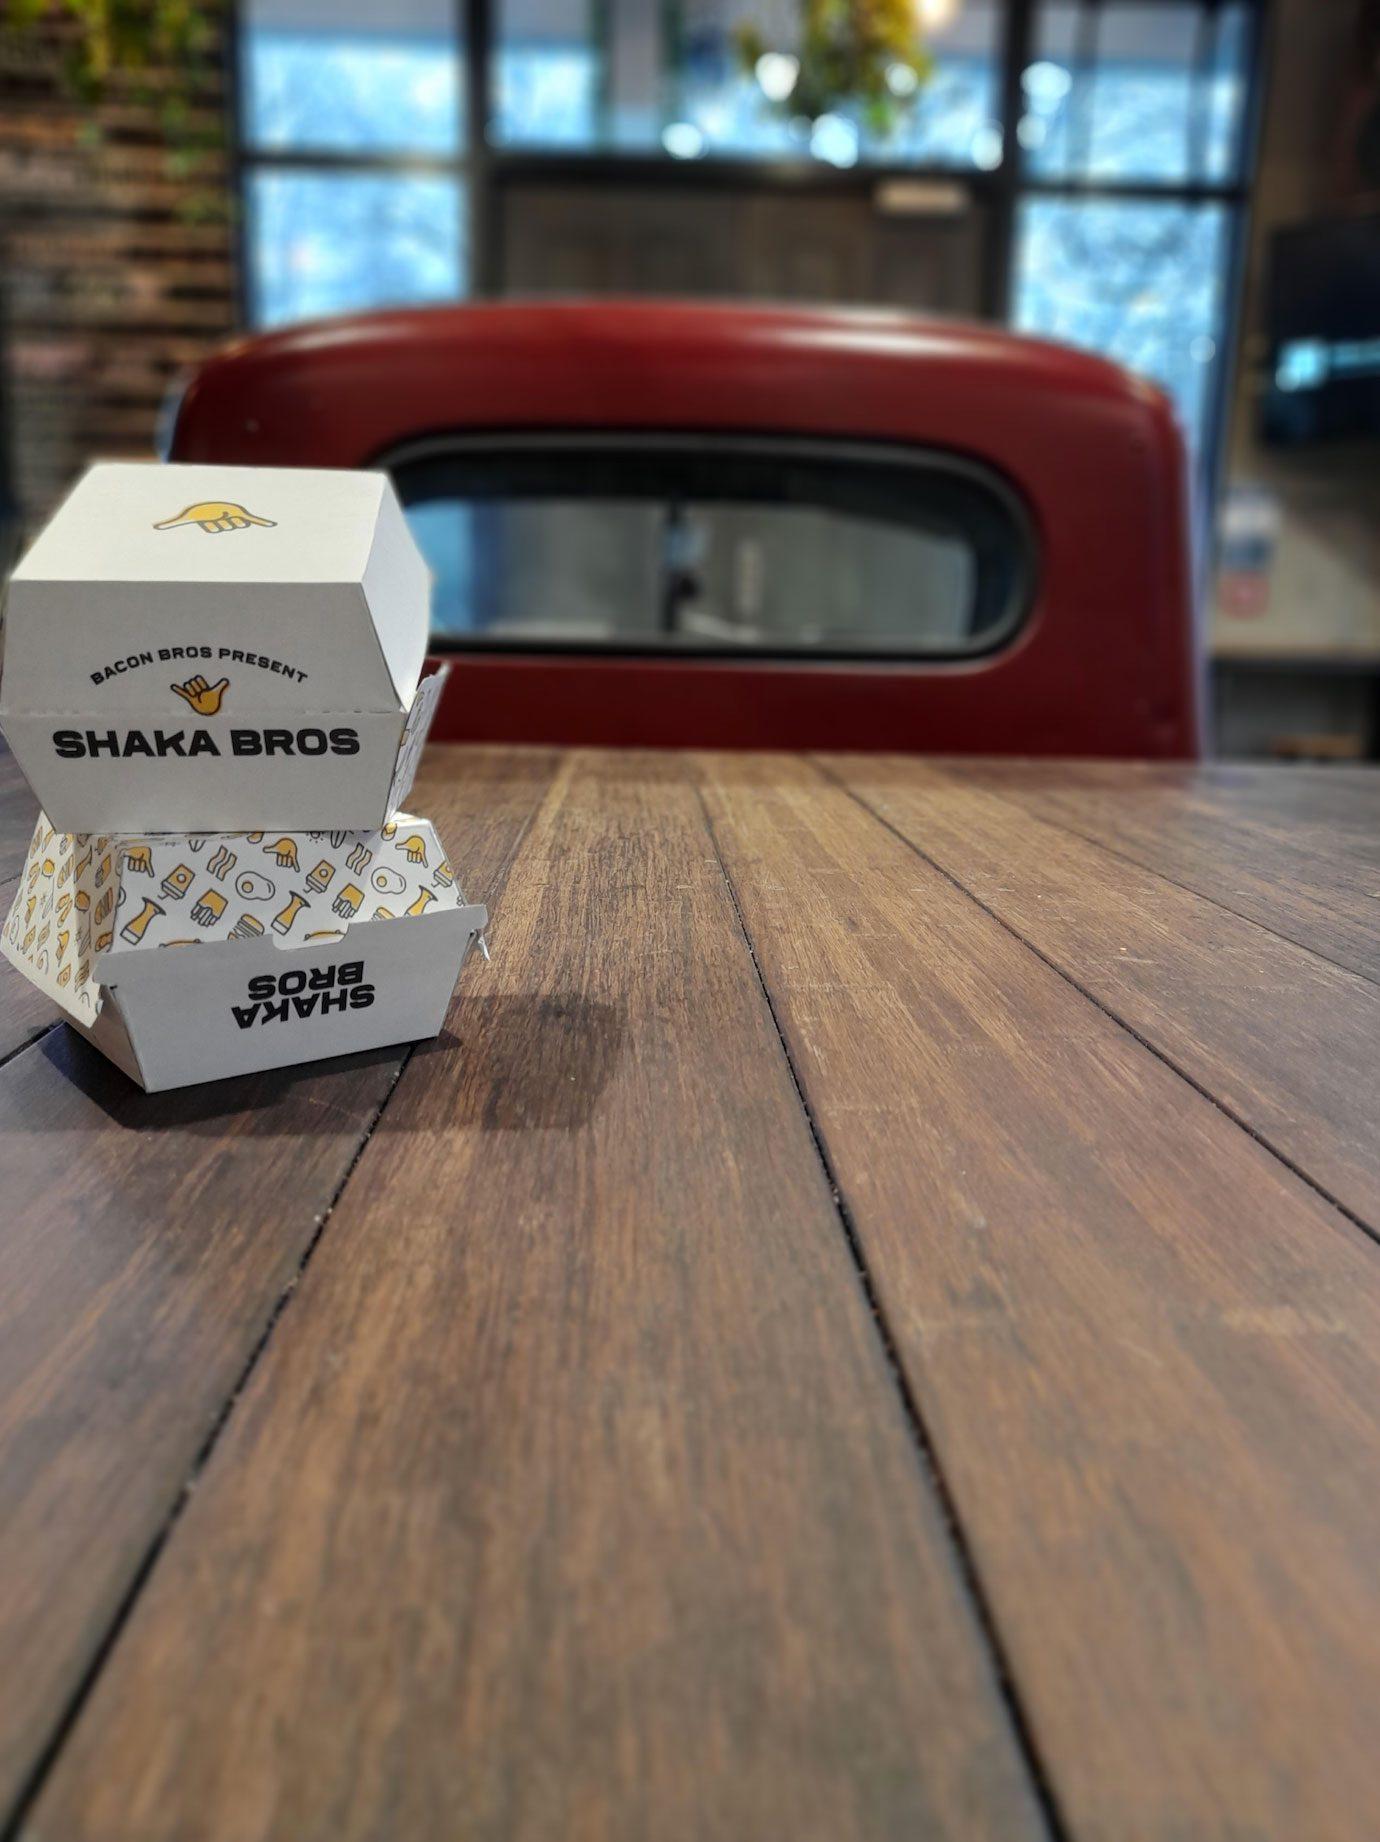 Shaka Bros Christchurch